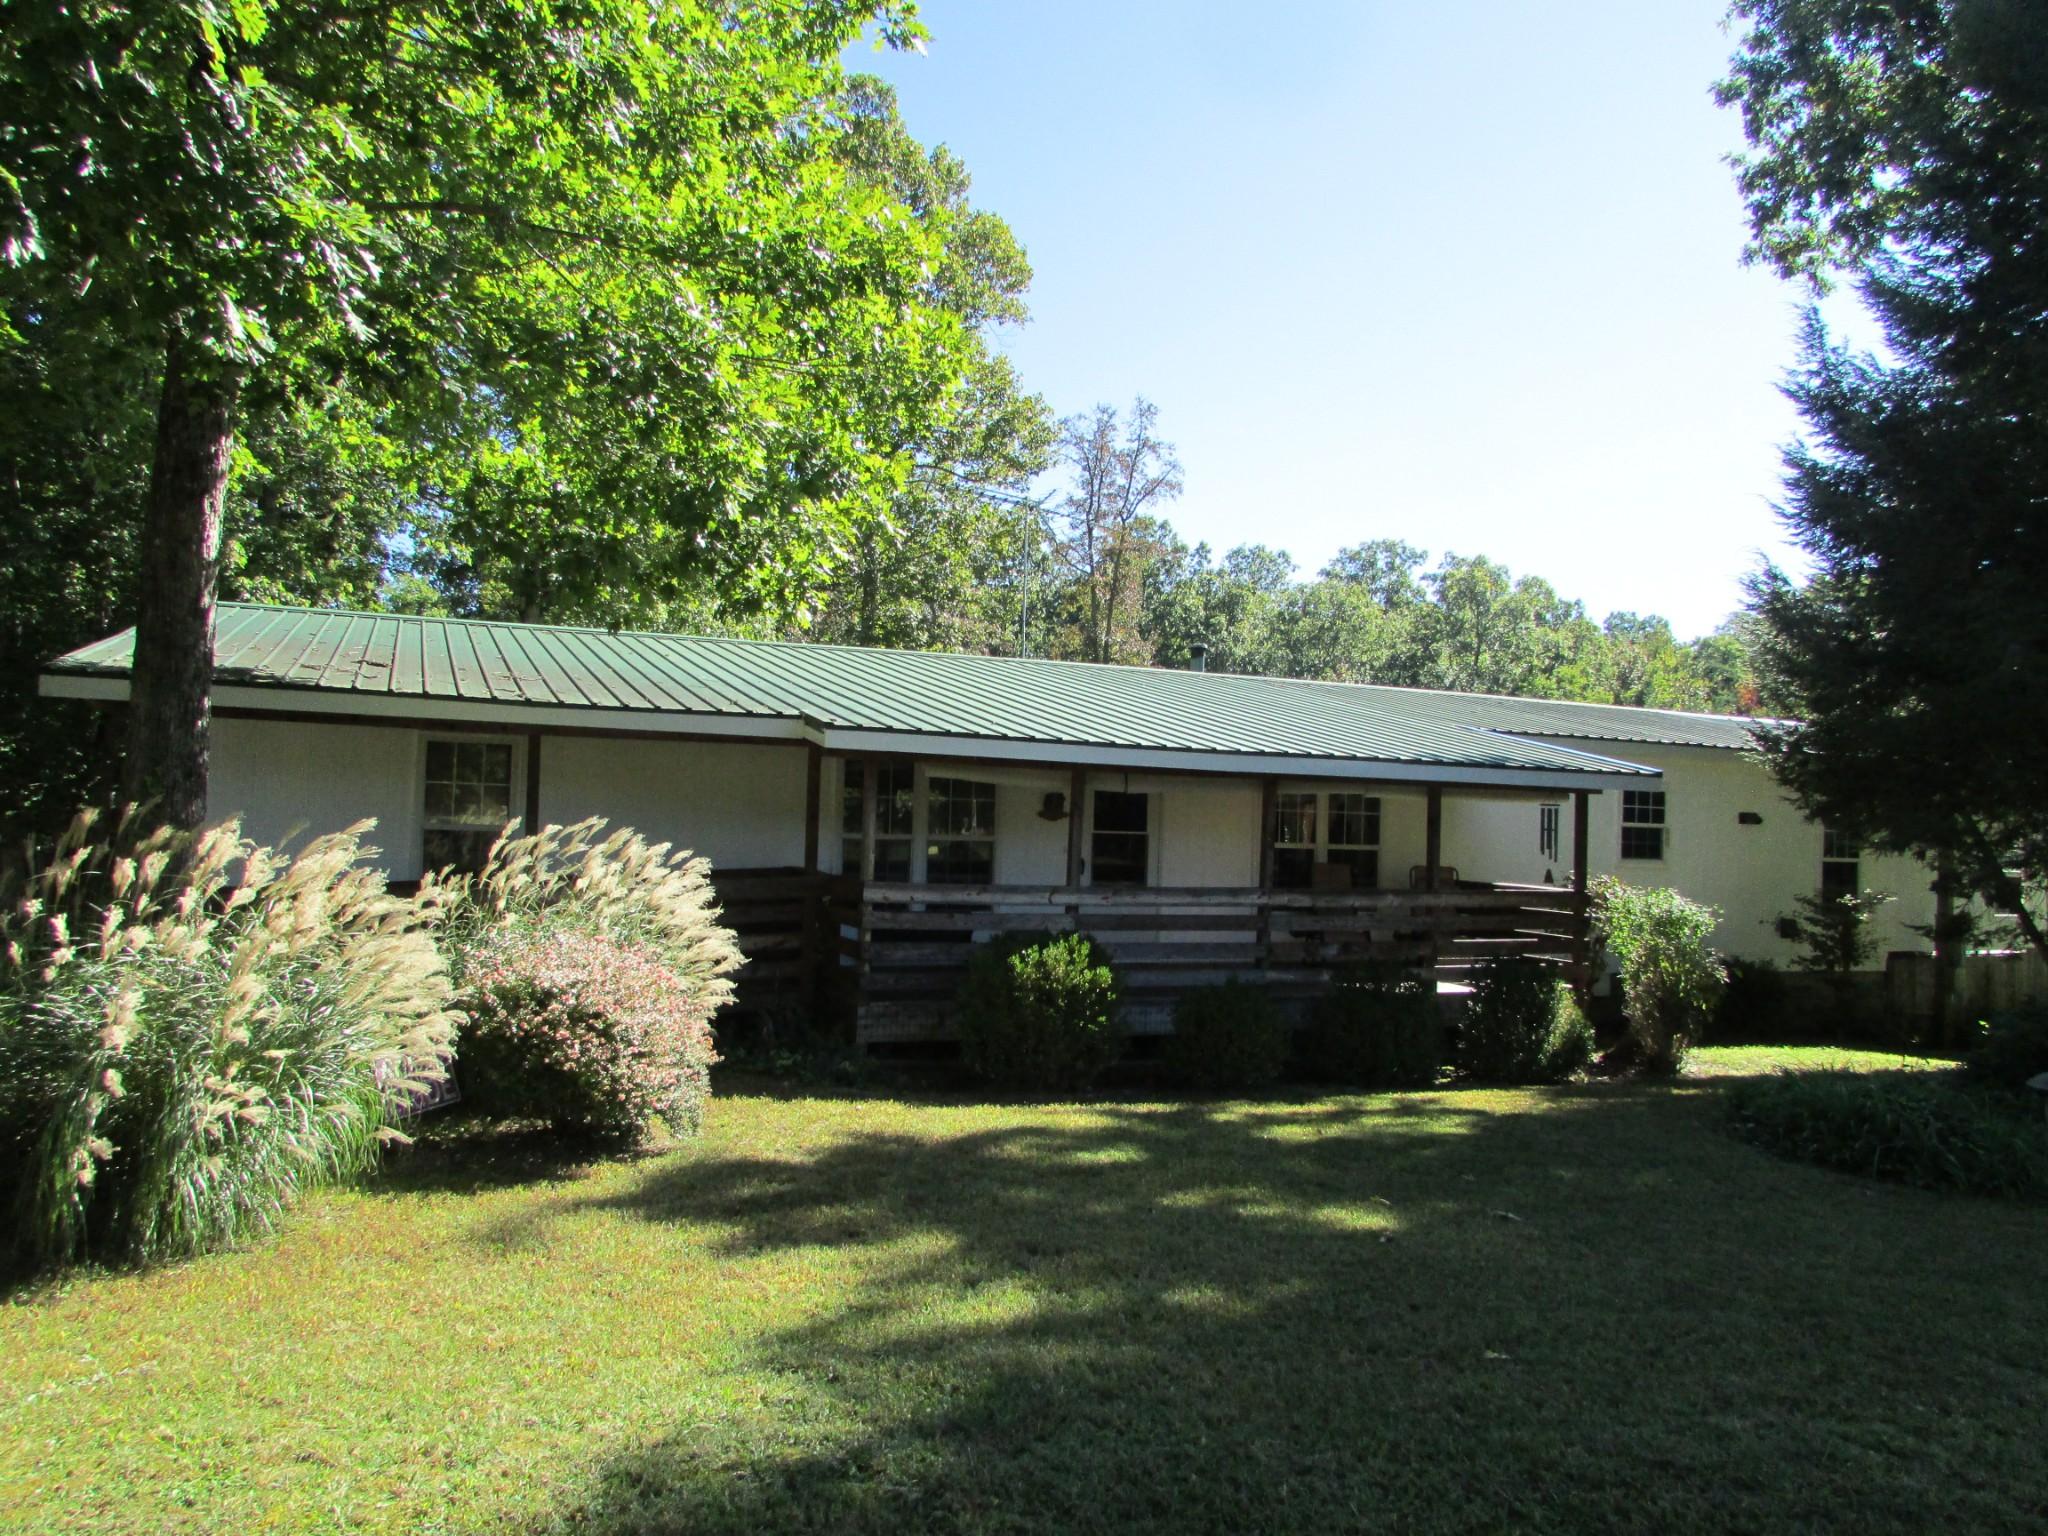 480 Henley Dr Property Photo - Altamont, TN real estate listing